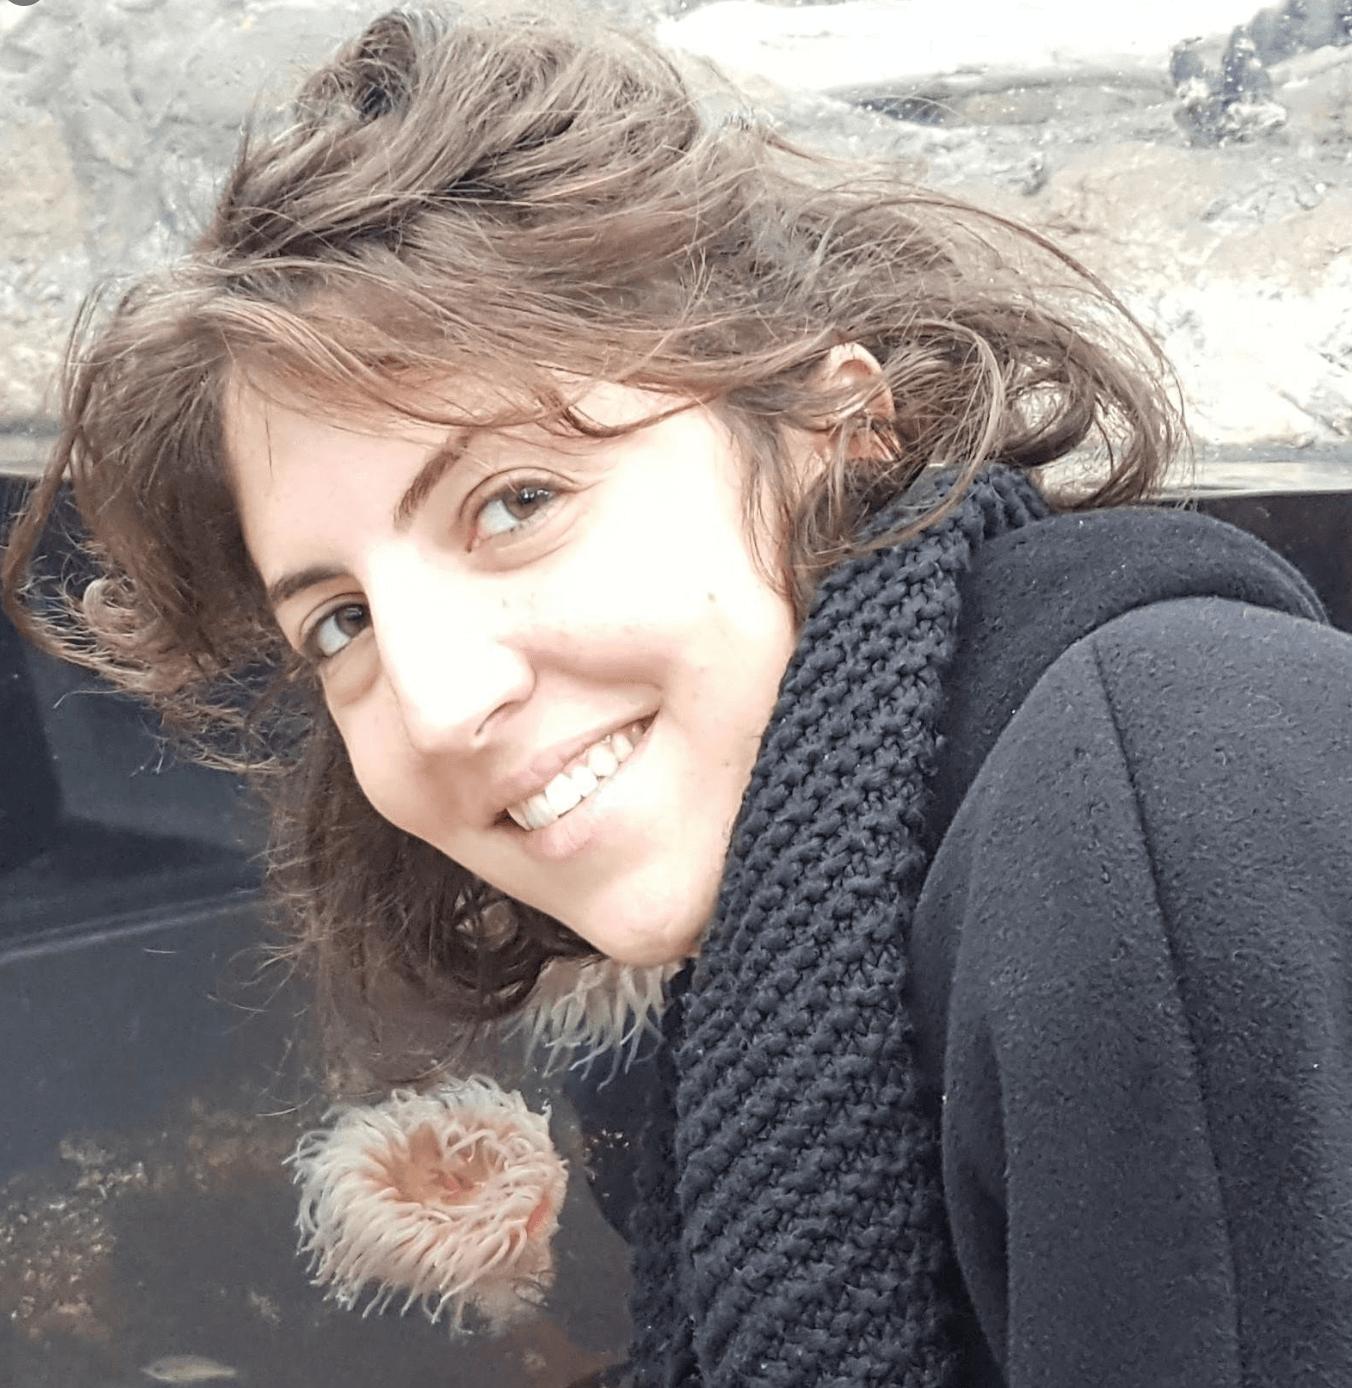 Marwa El-Zein